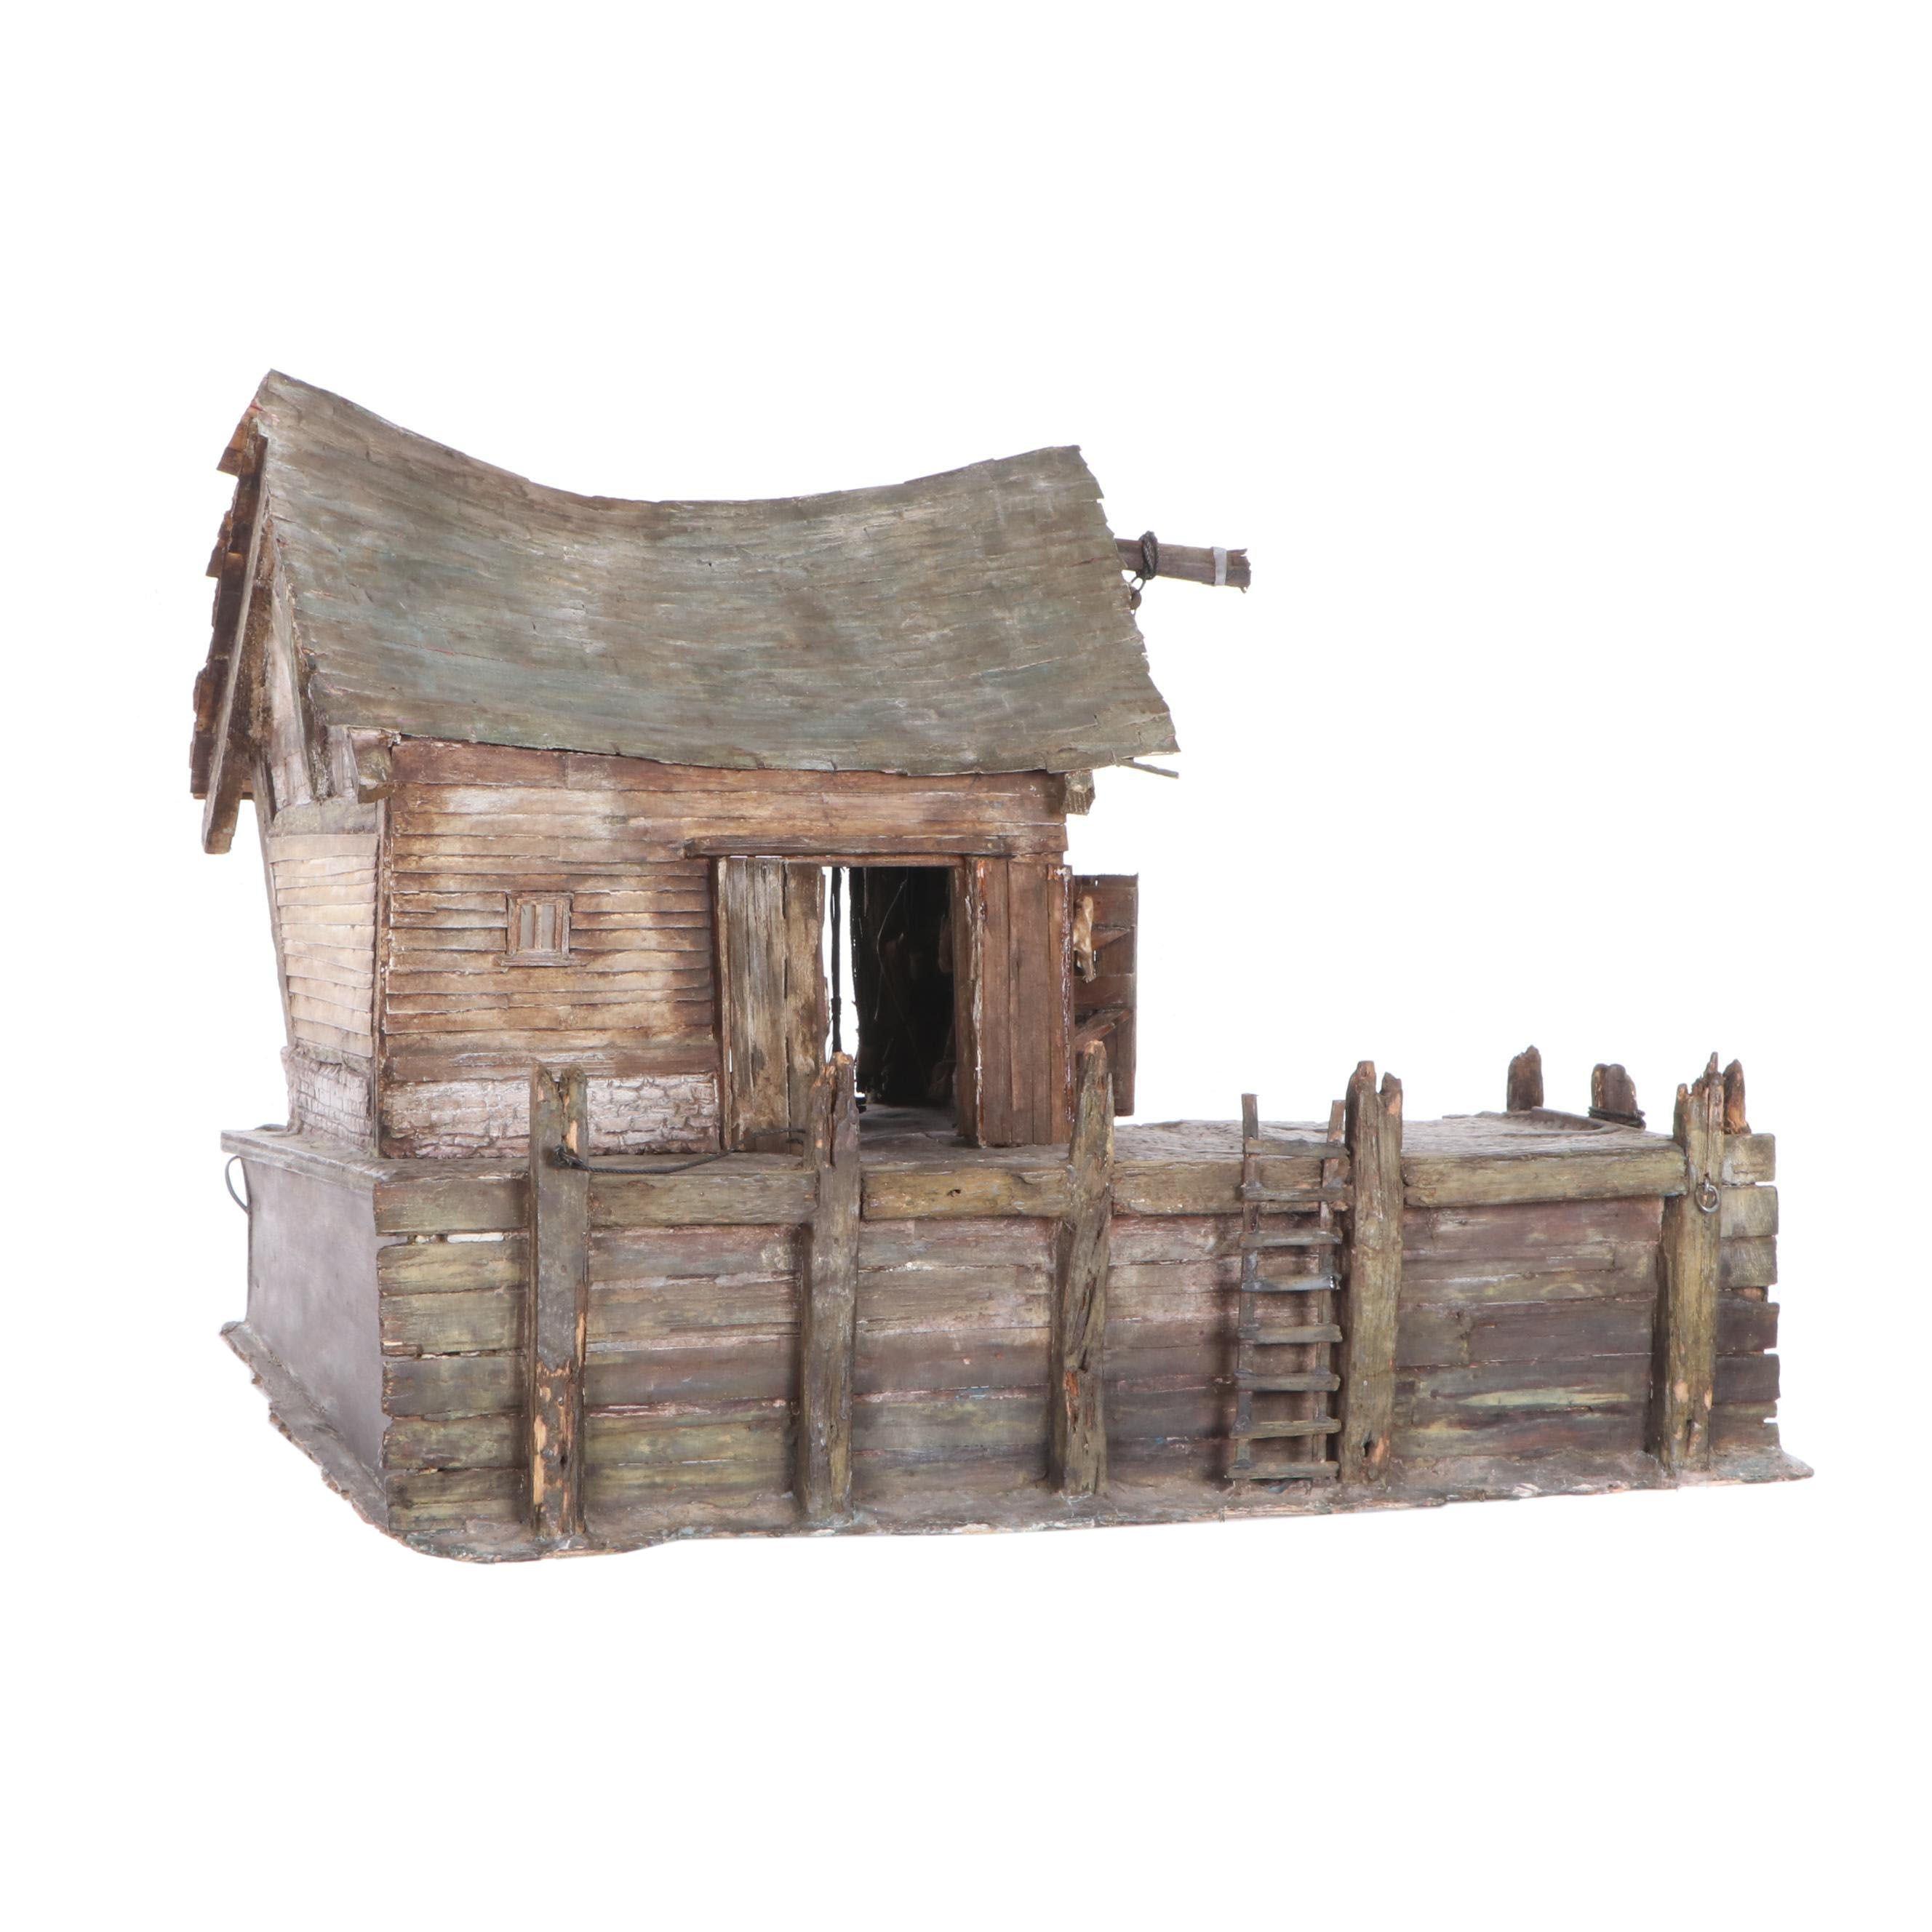 English Seaside Dock Driftwood Dollhouse Miniature